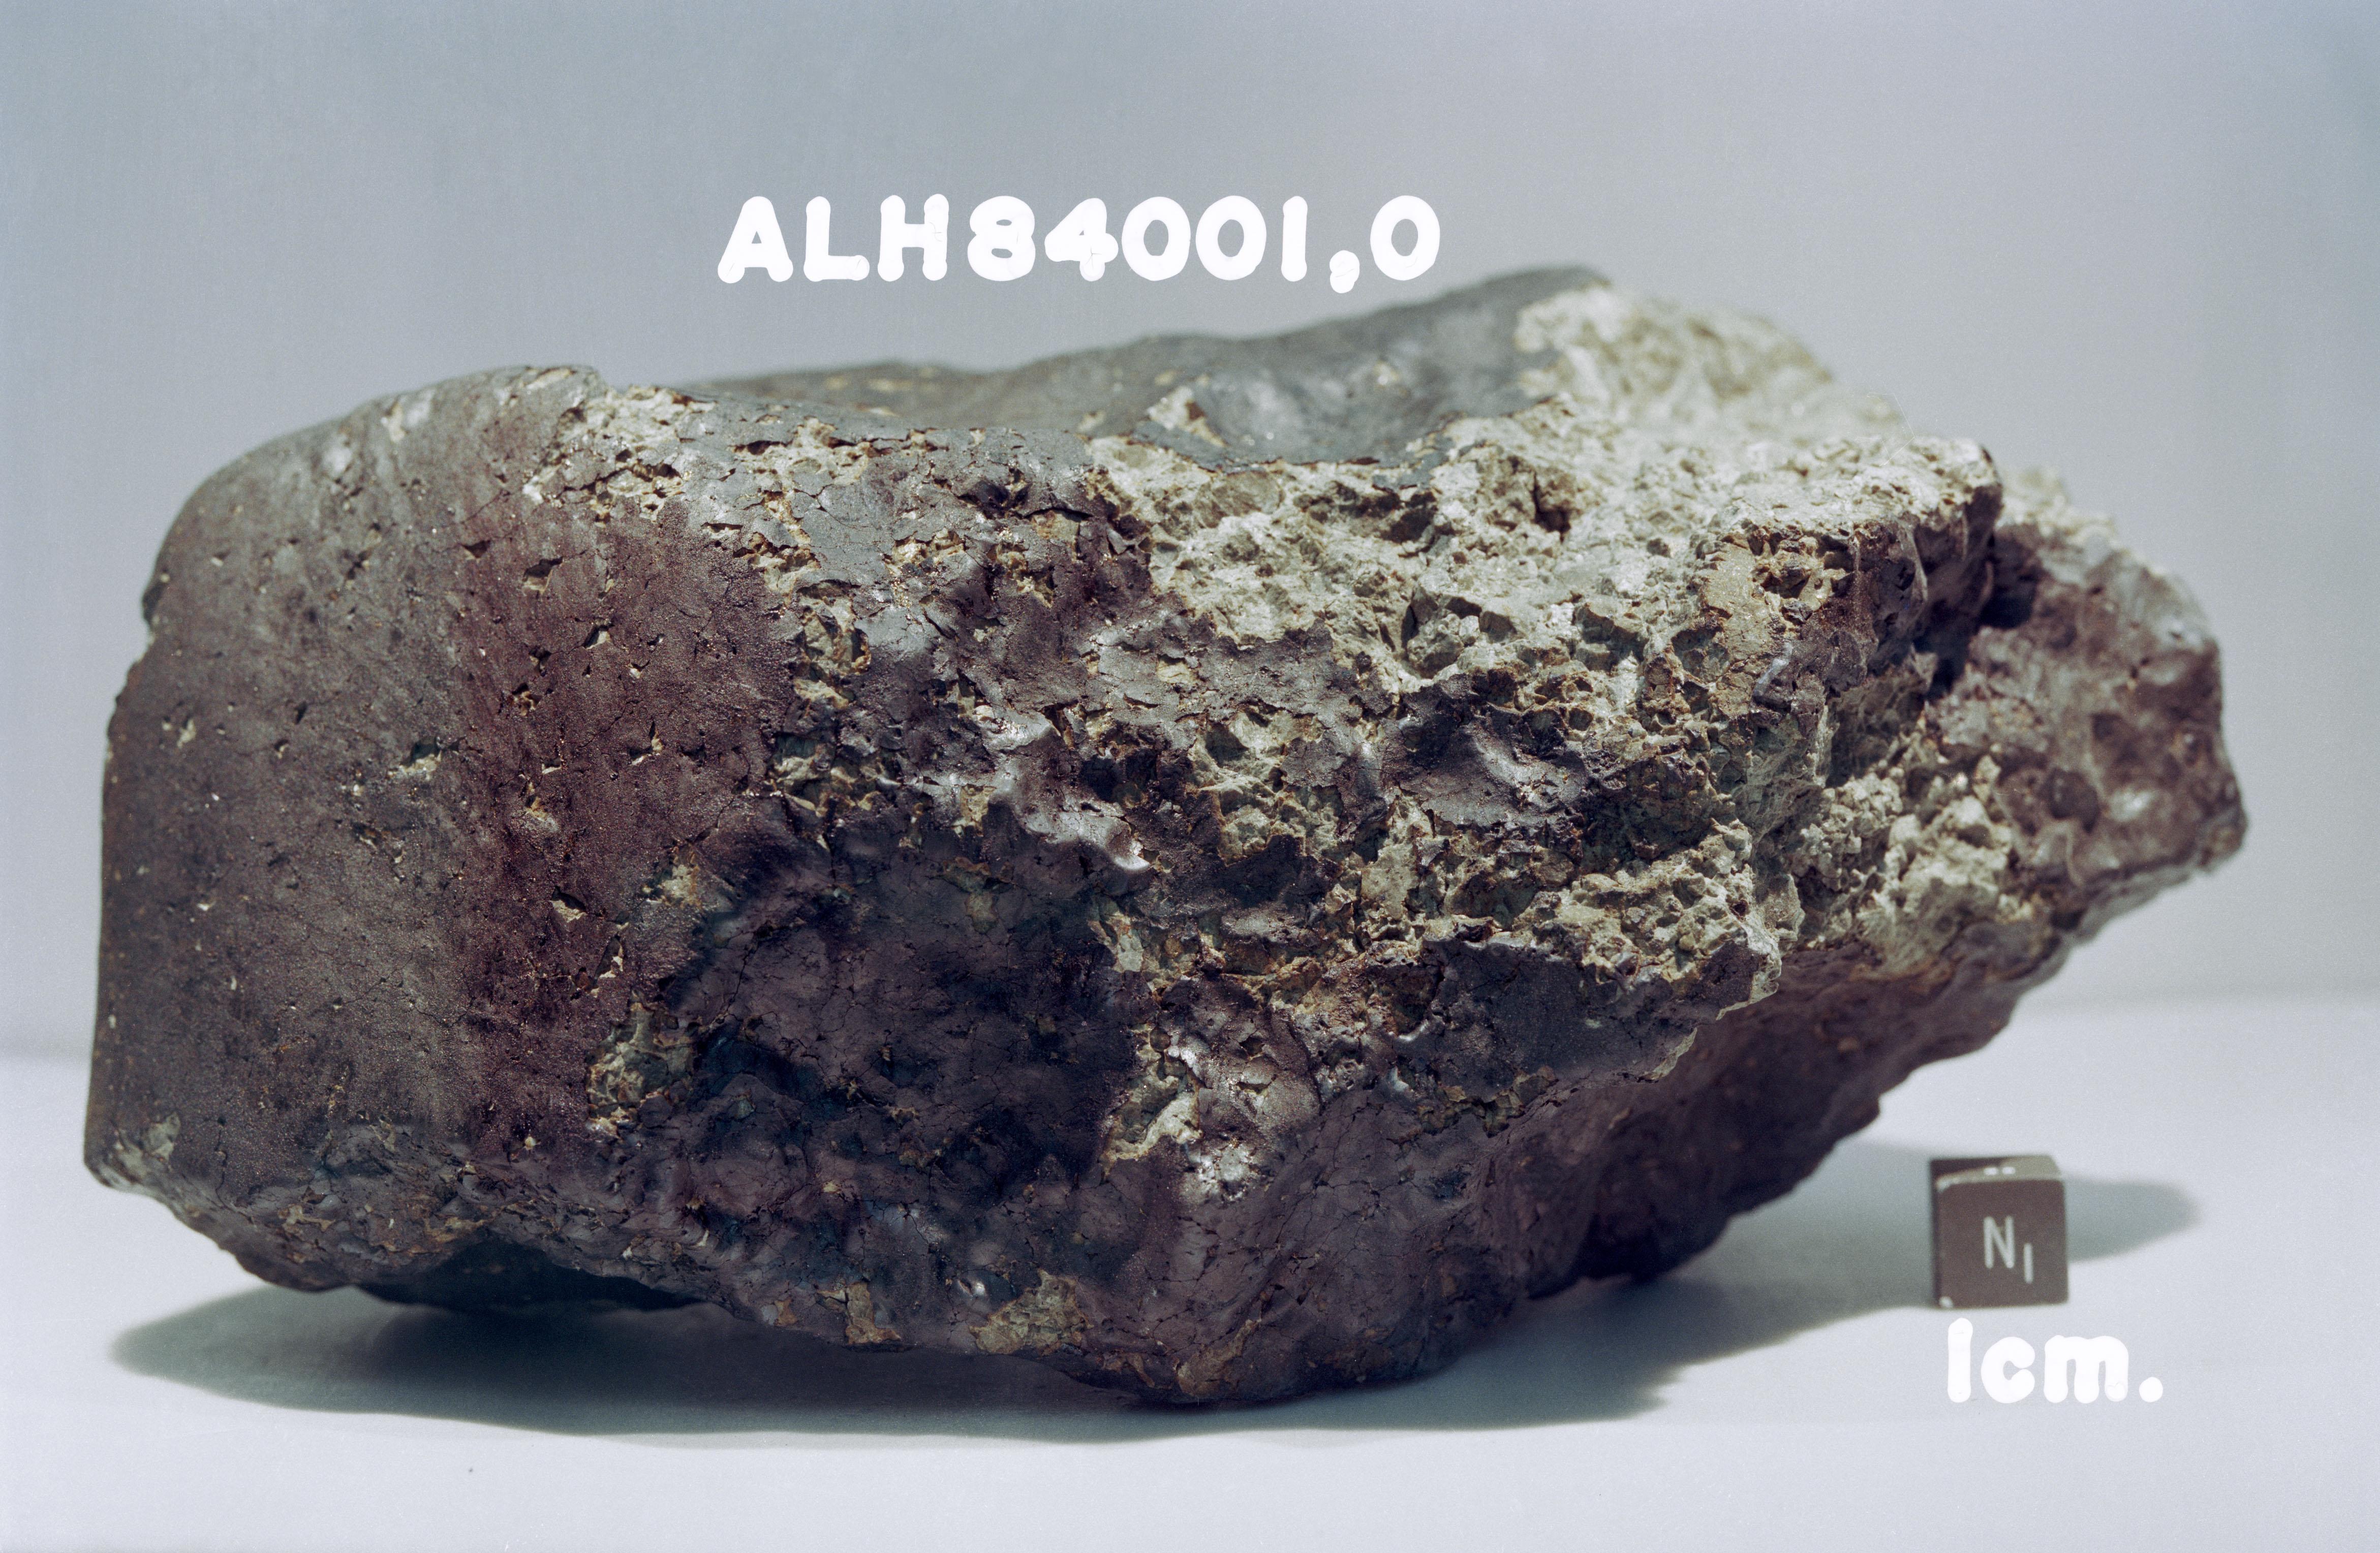 File:ALH84001.jpg